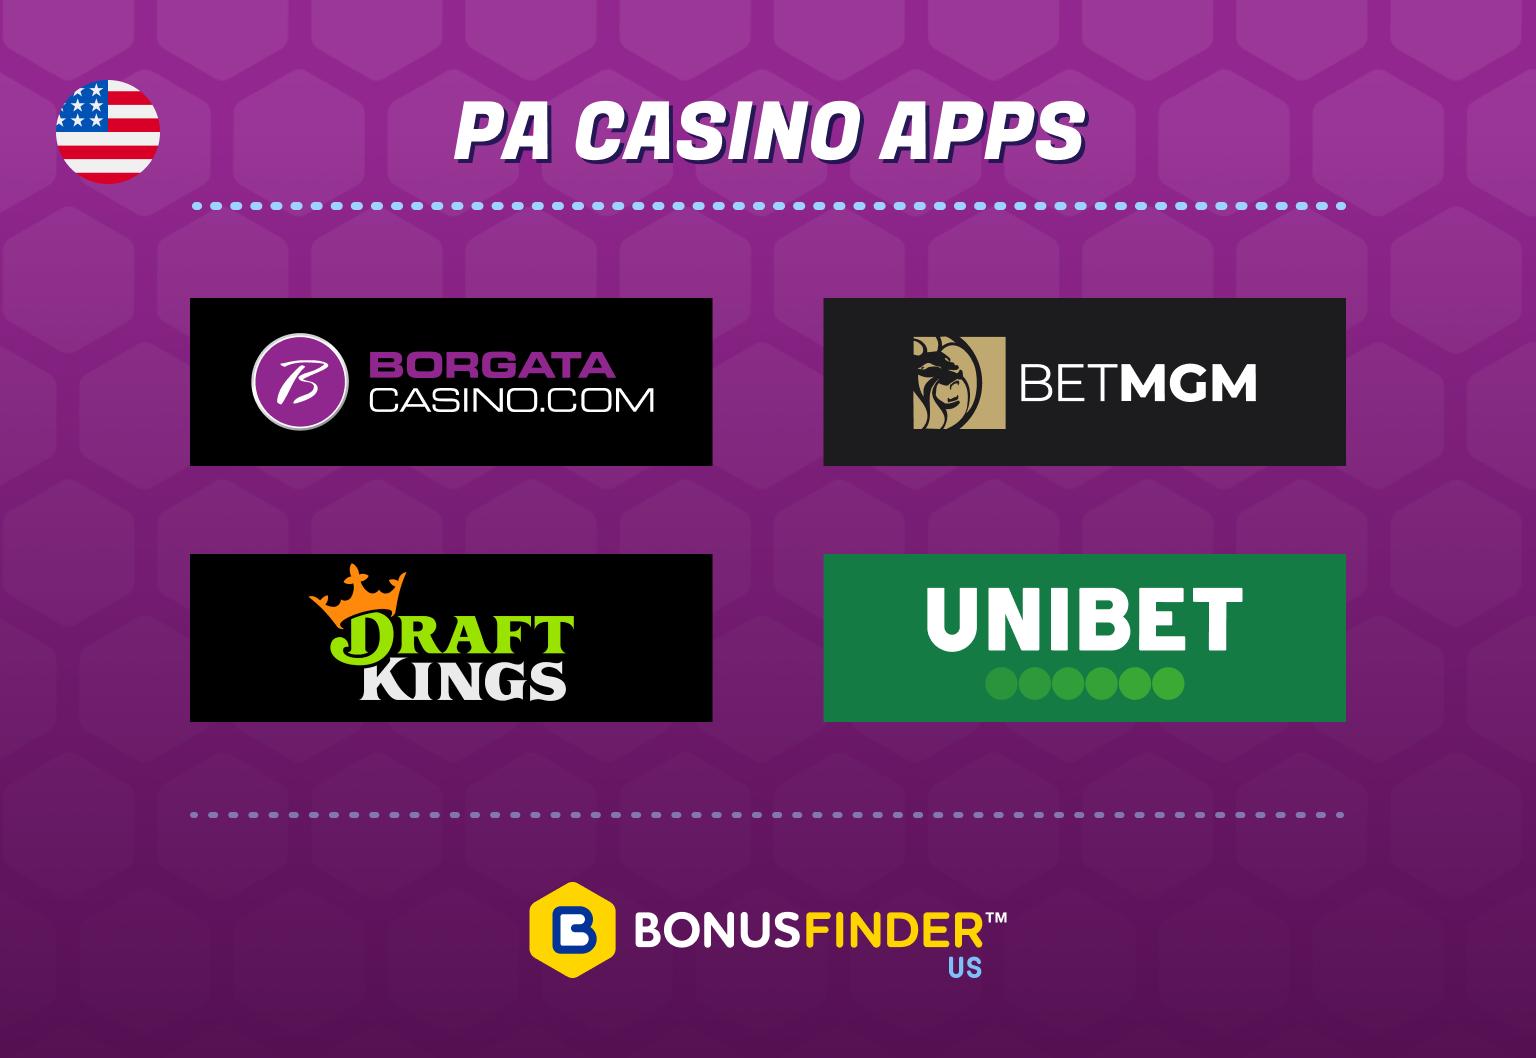 PA Online Casino Apps